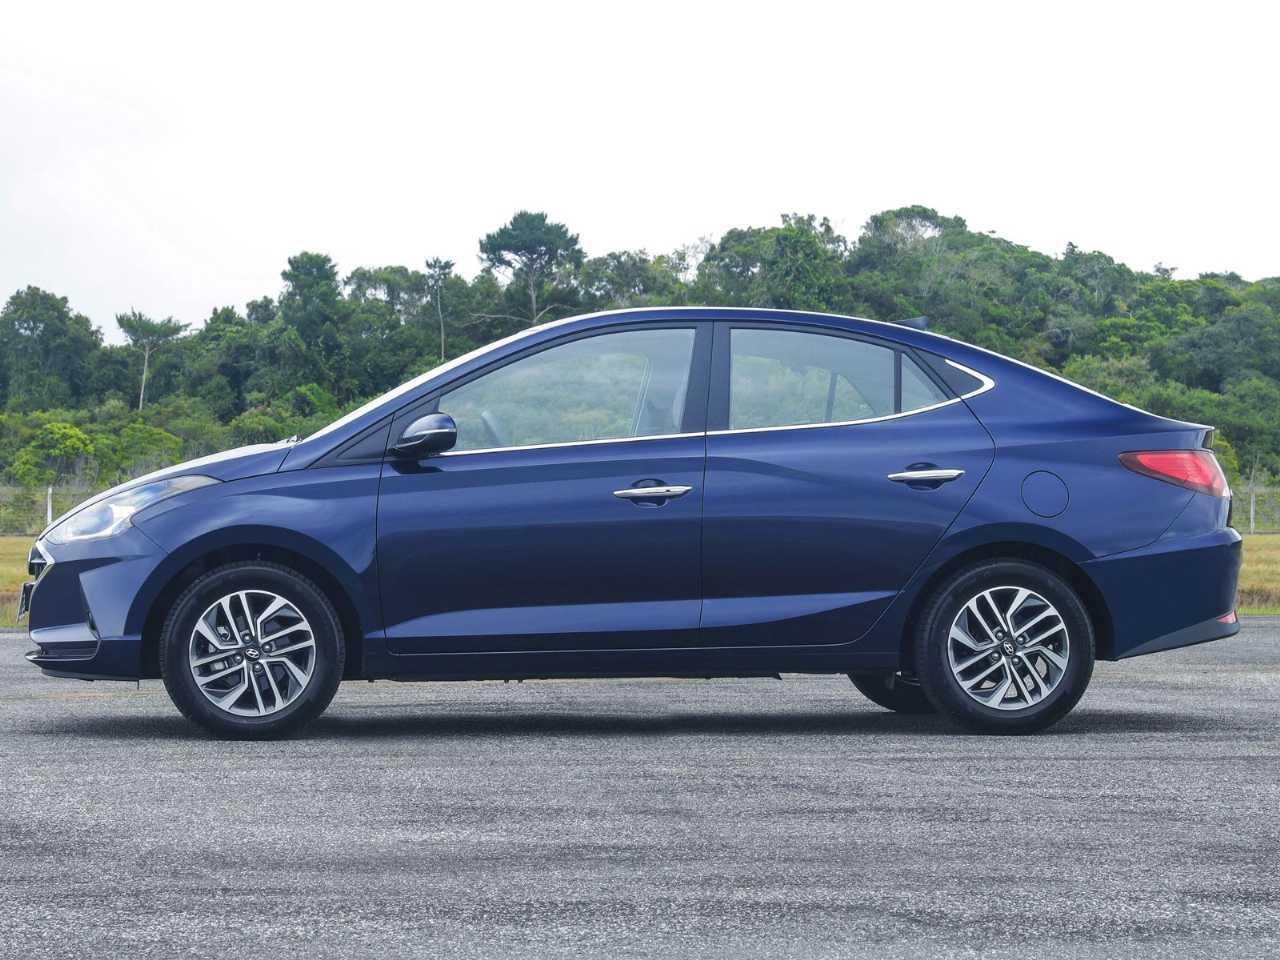 HyundaiHB20S 2020 - lateral